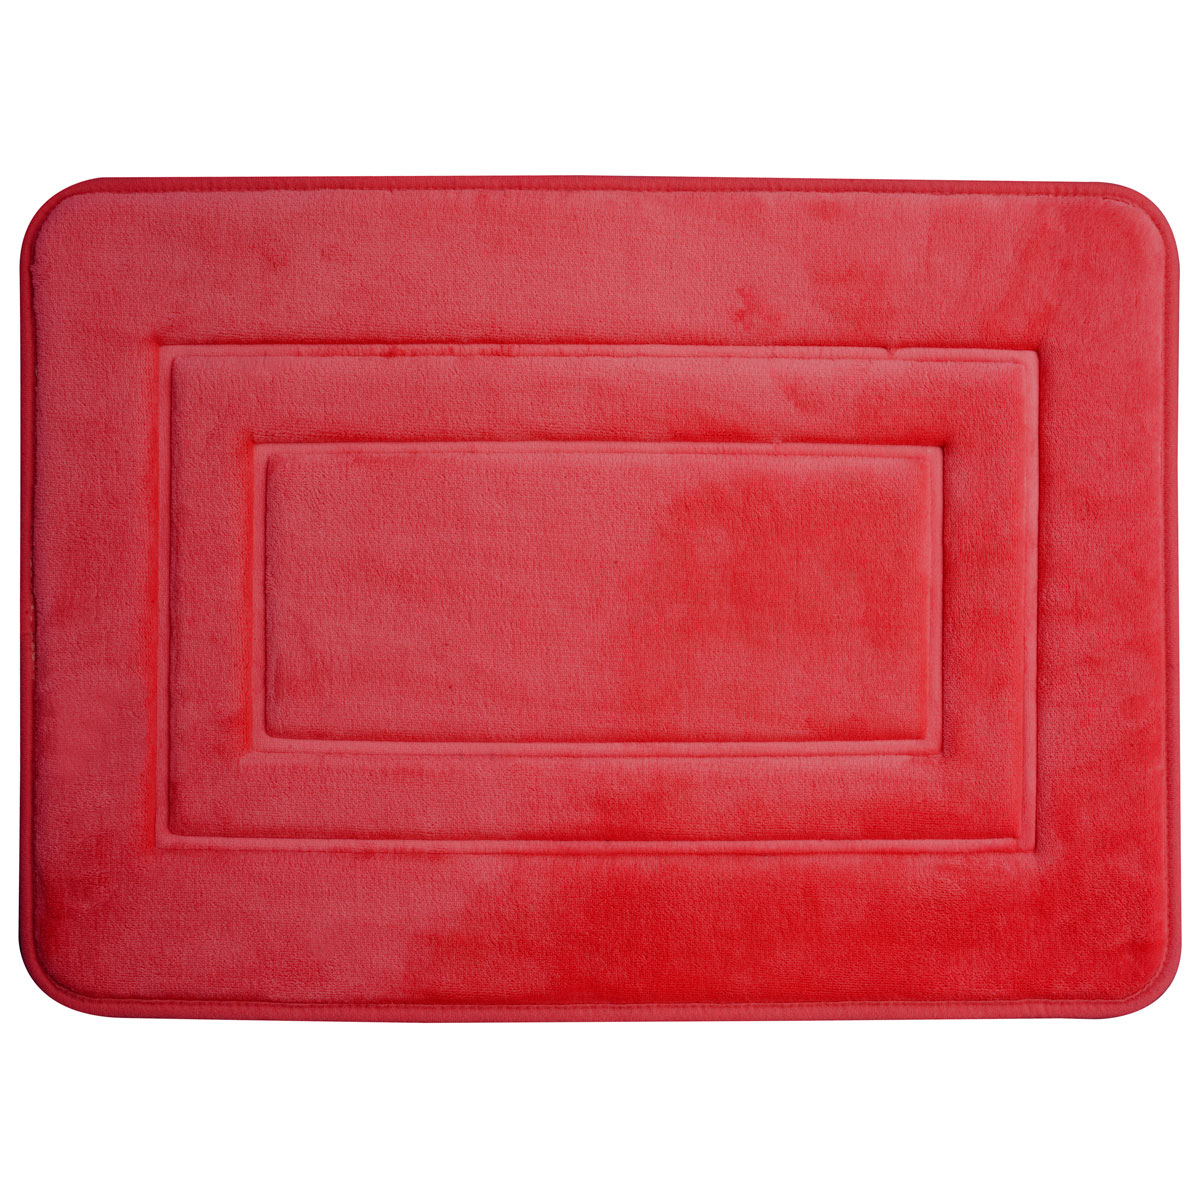 Super mäkká kúpeľňa koberec 40x60 San červená